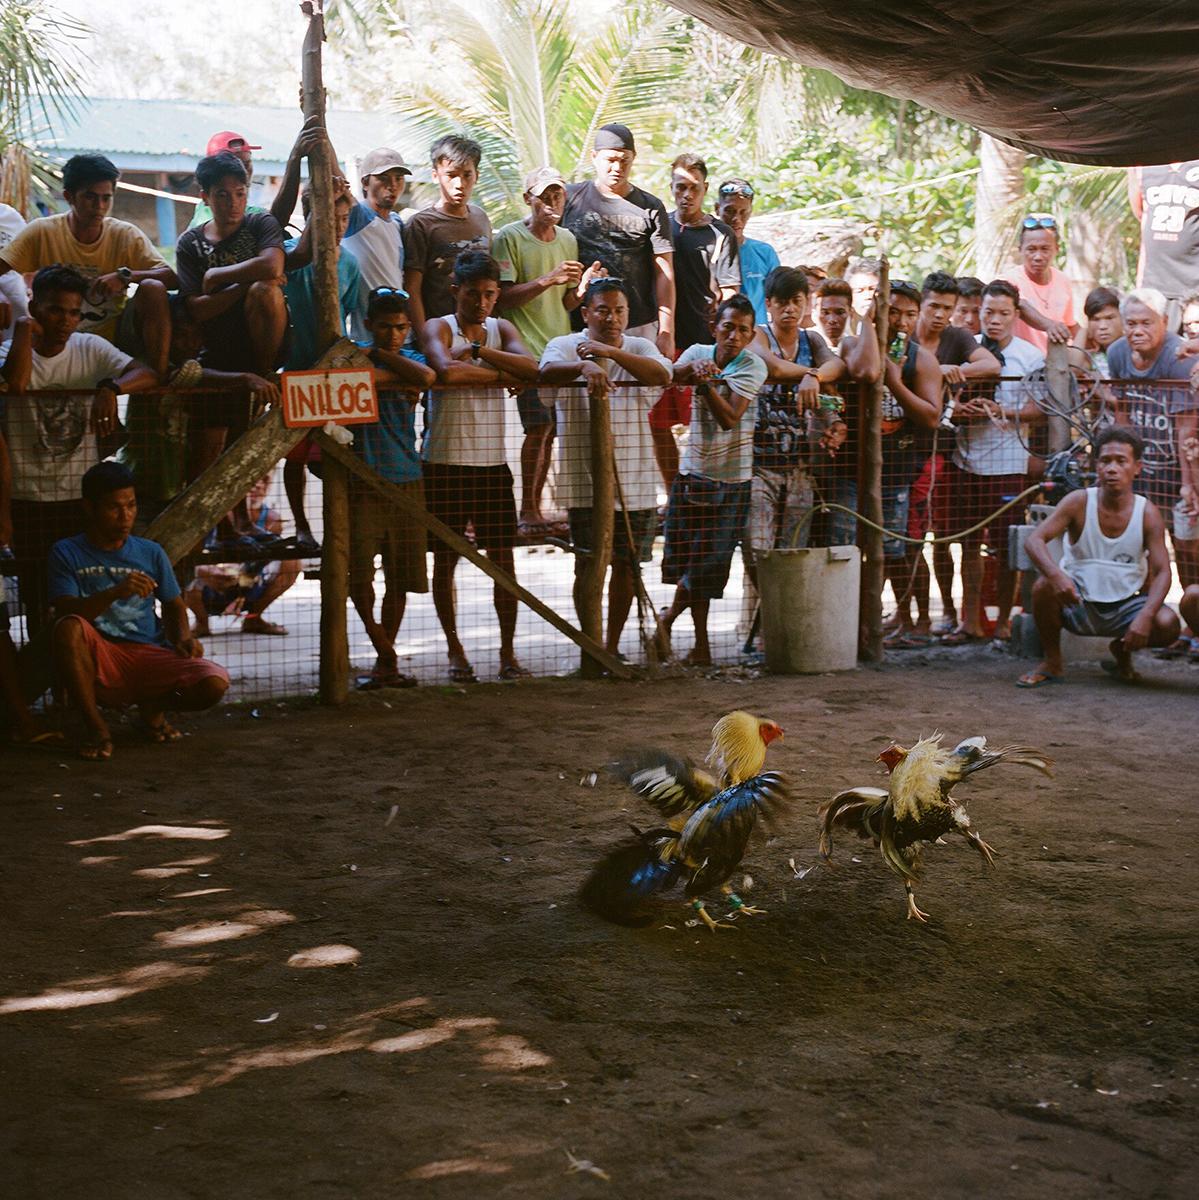 Peleas de gallos arnau elias contrafotografia